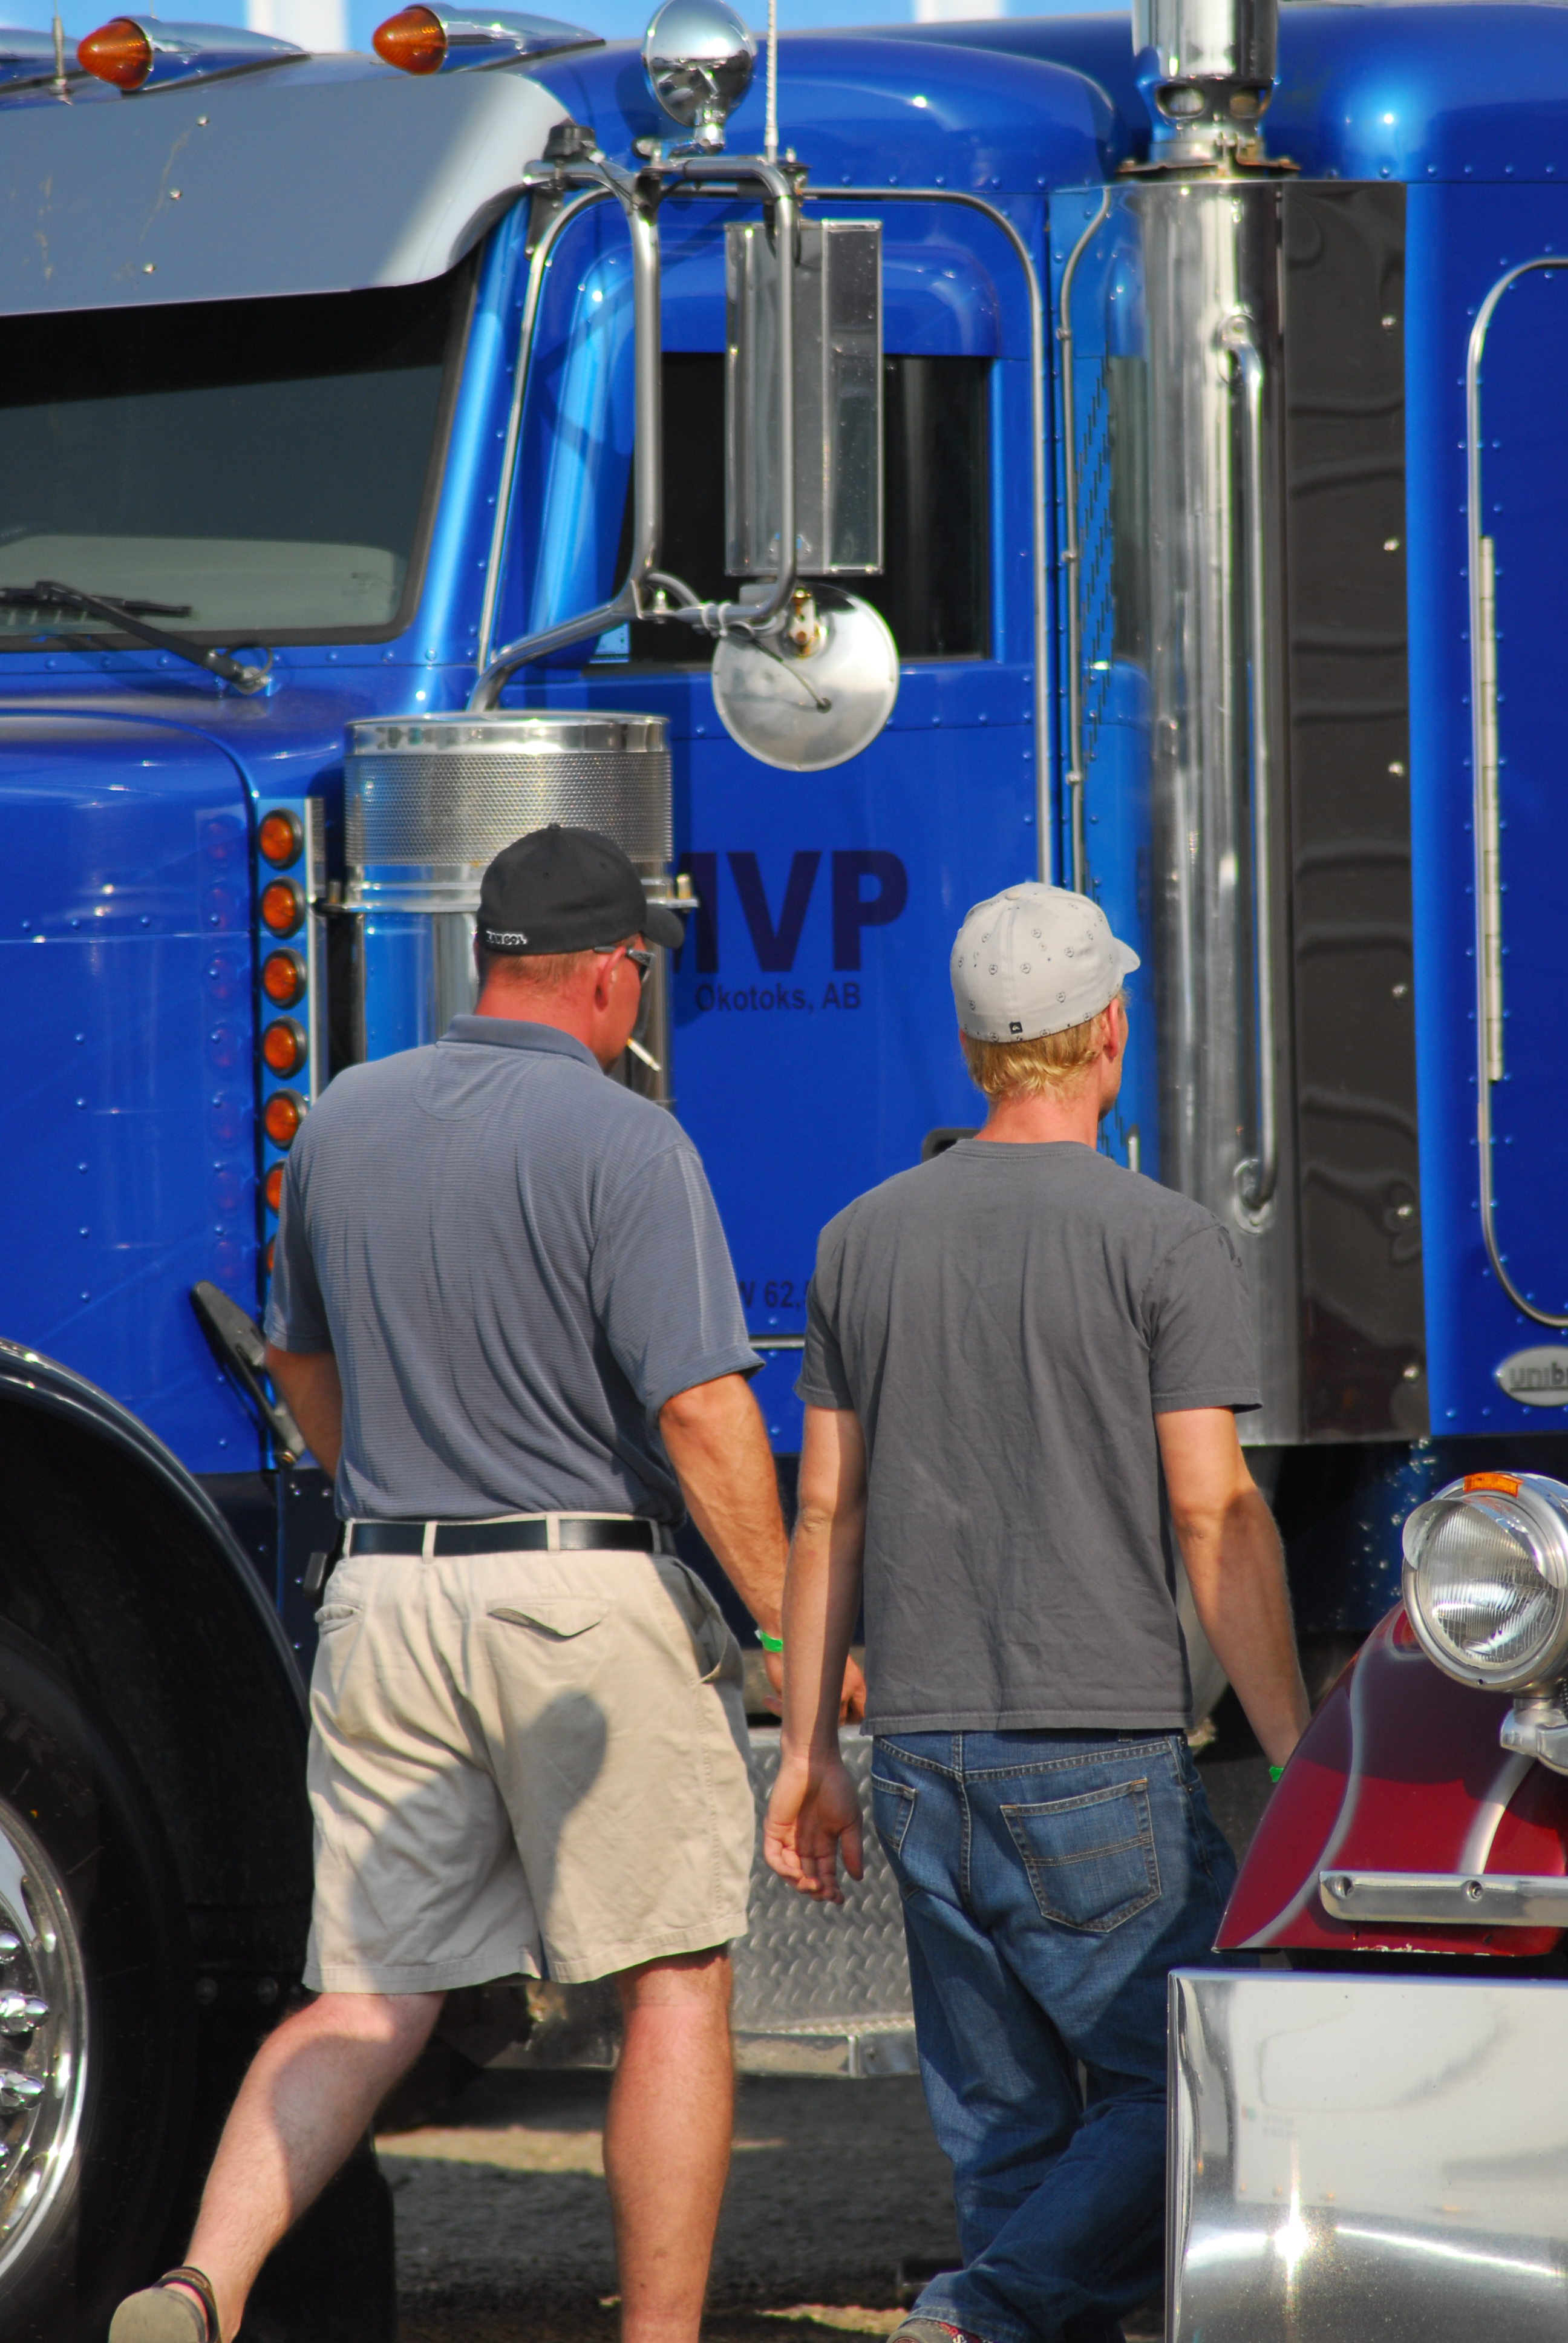 The Driver Shortage: Make it Someone Else's Problem